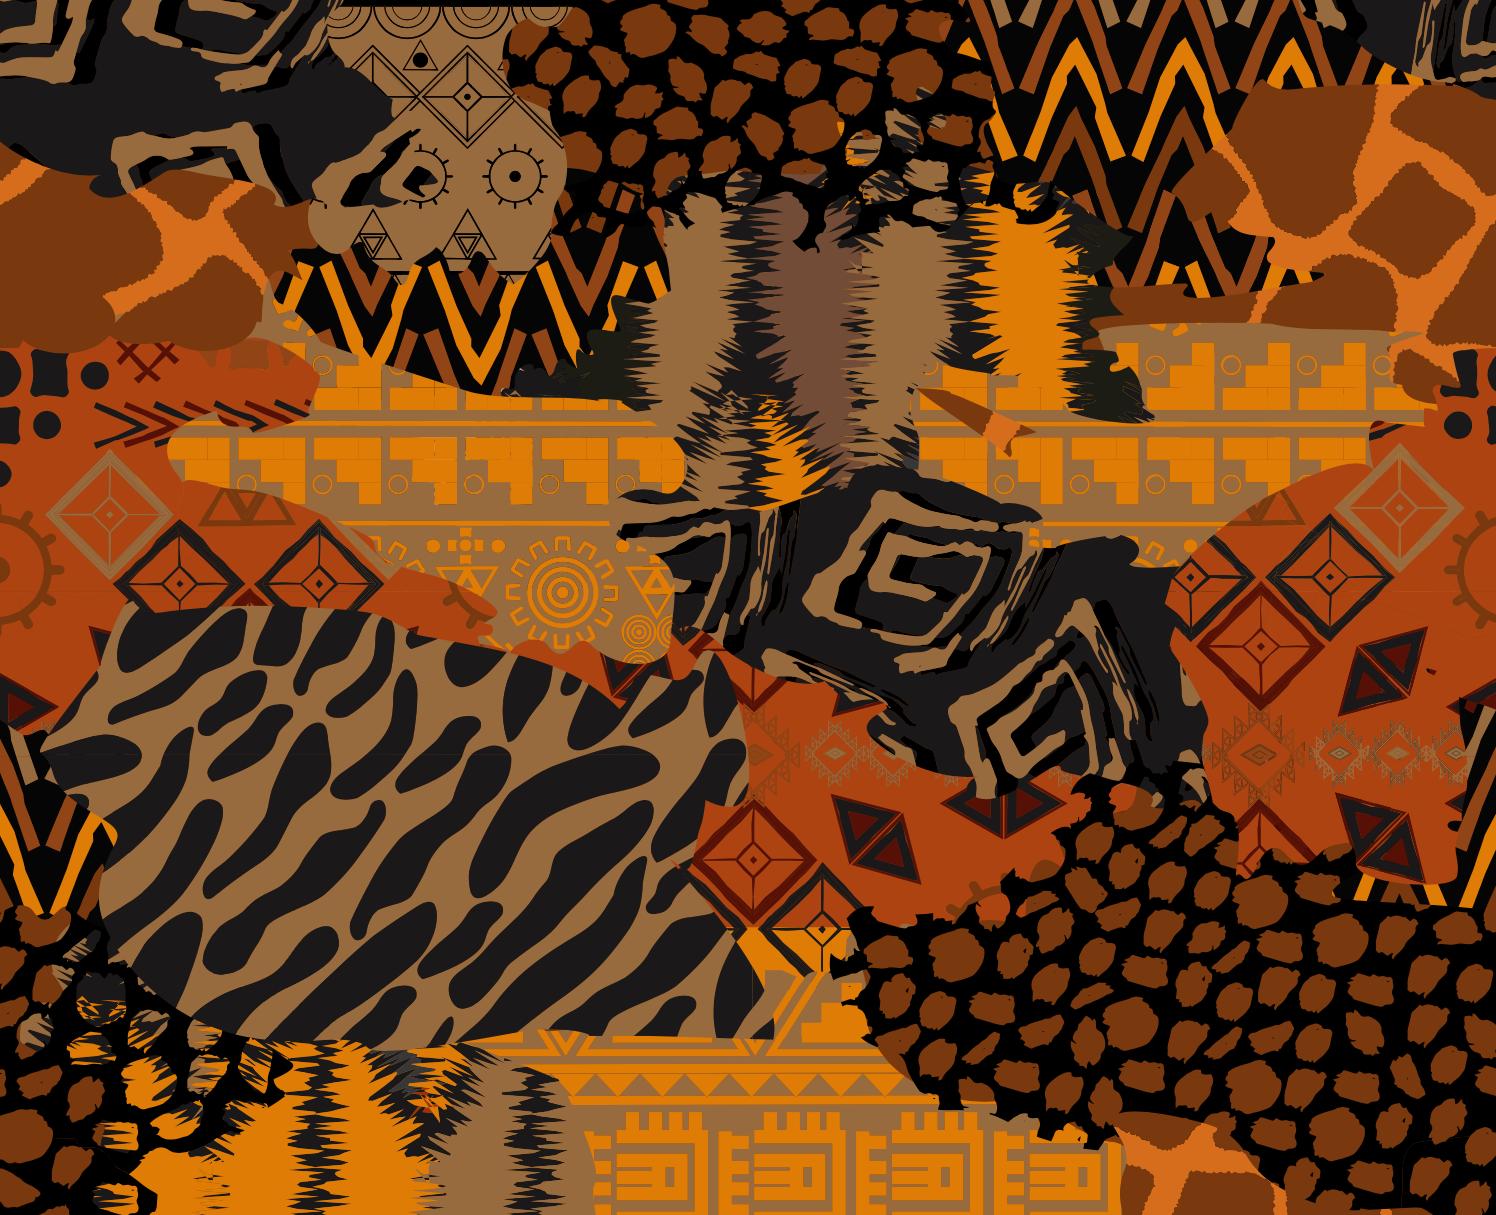 Afrikana Image